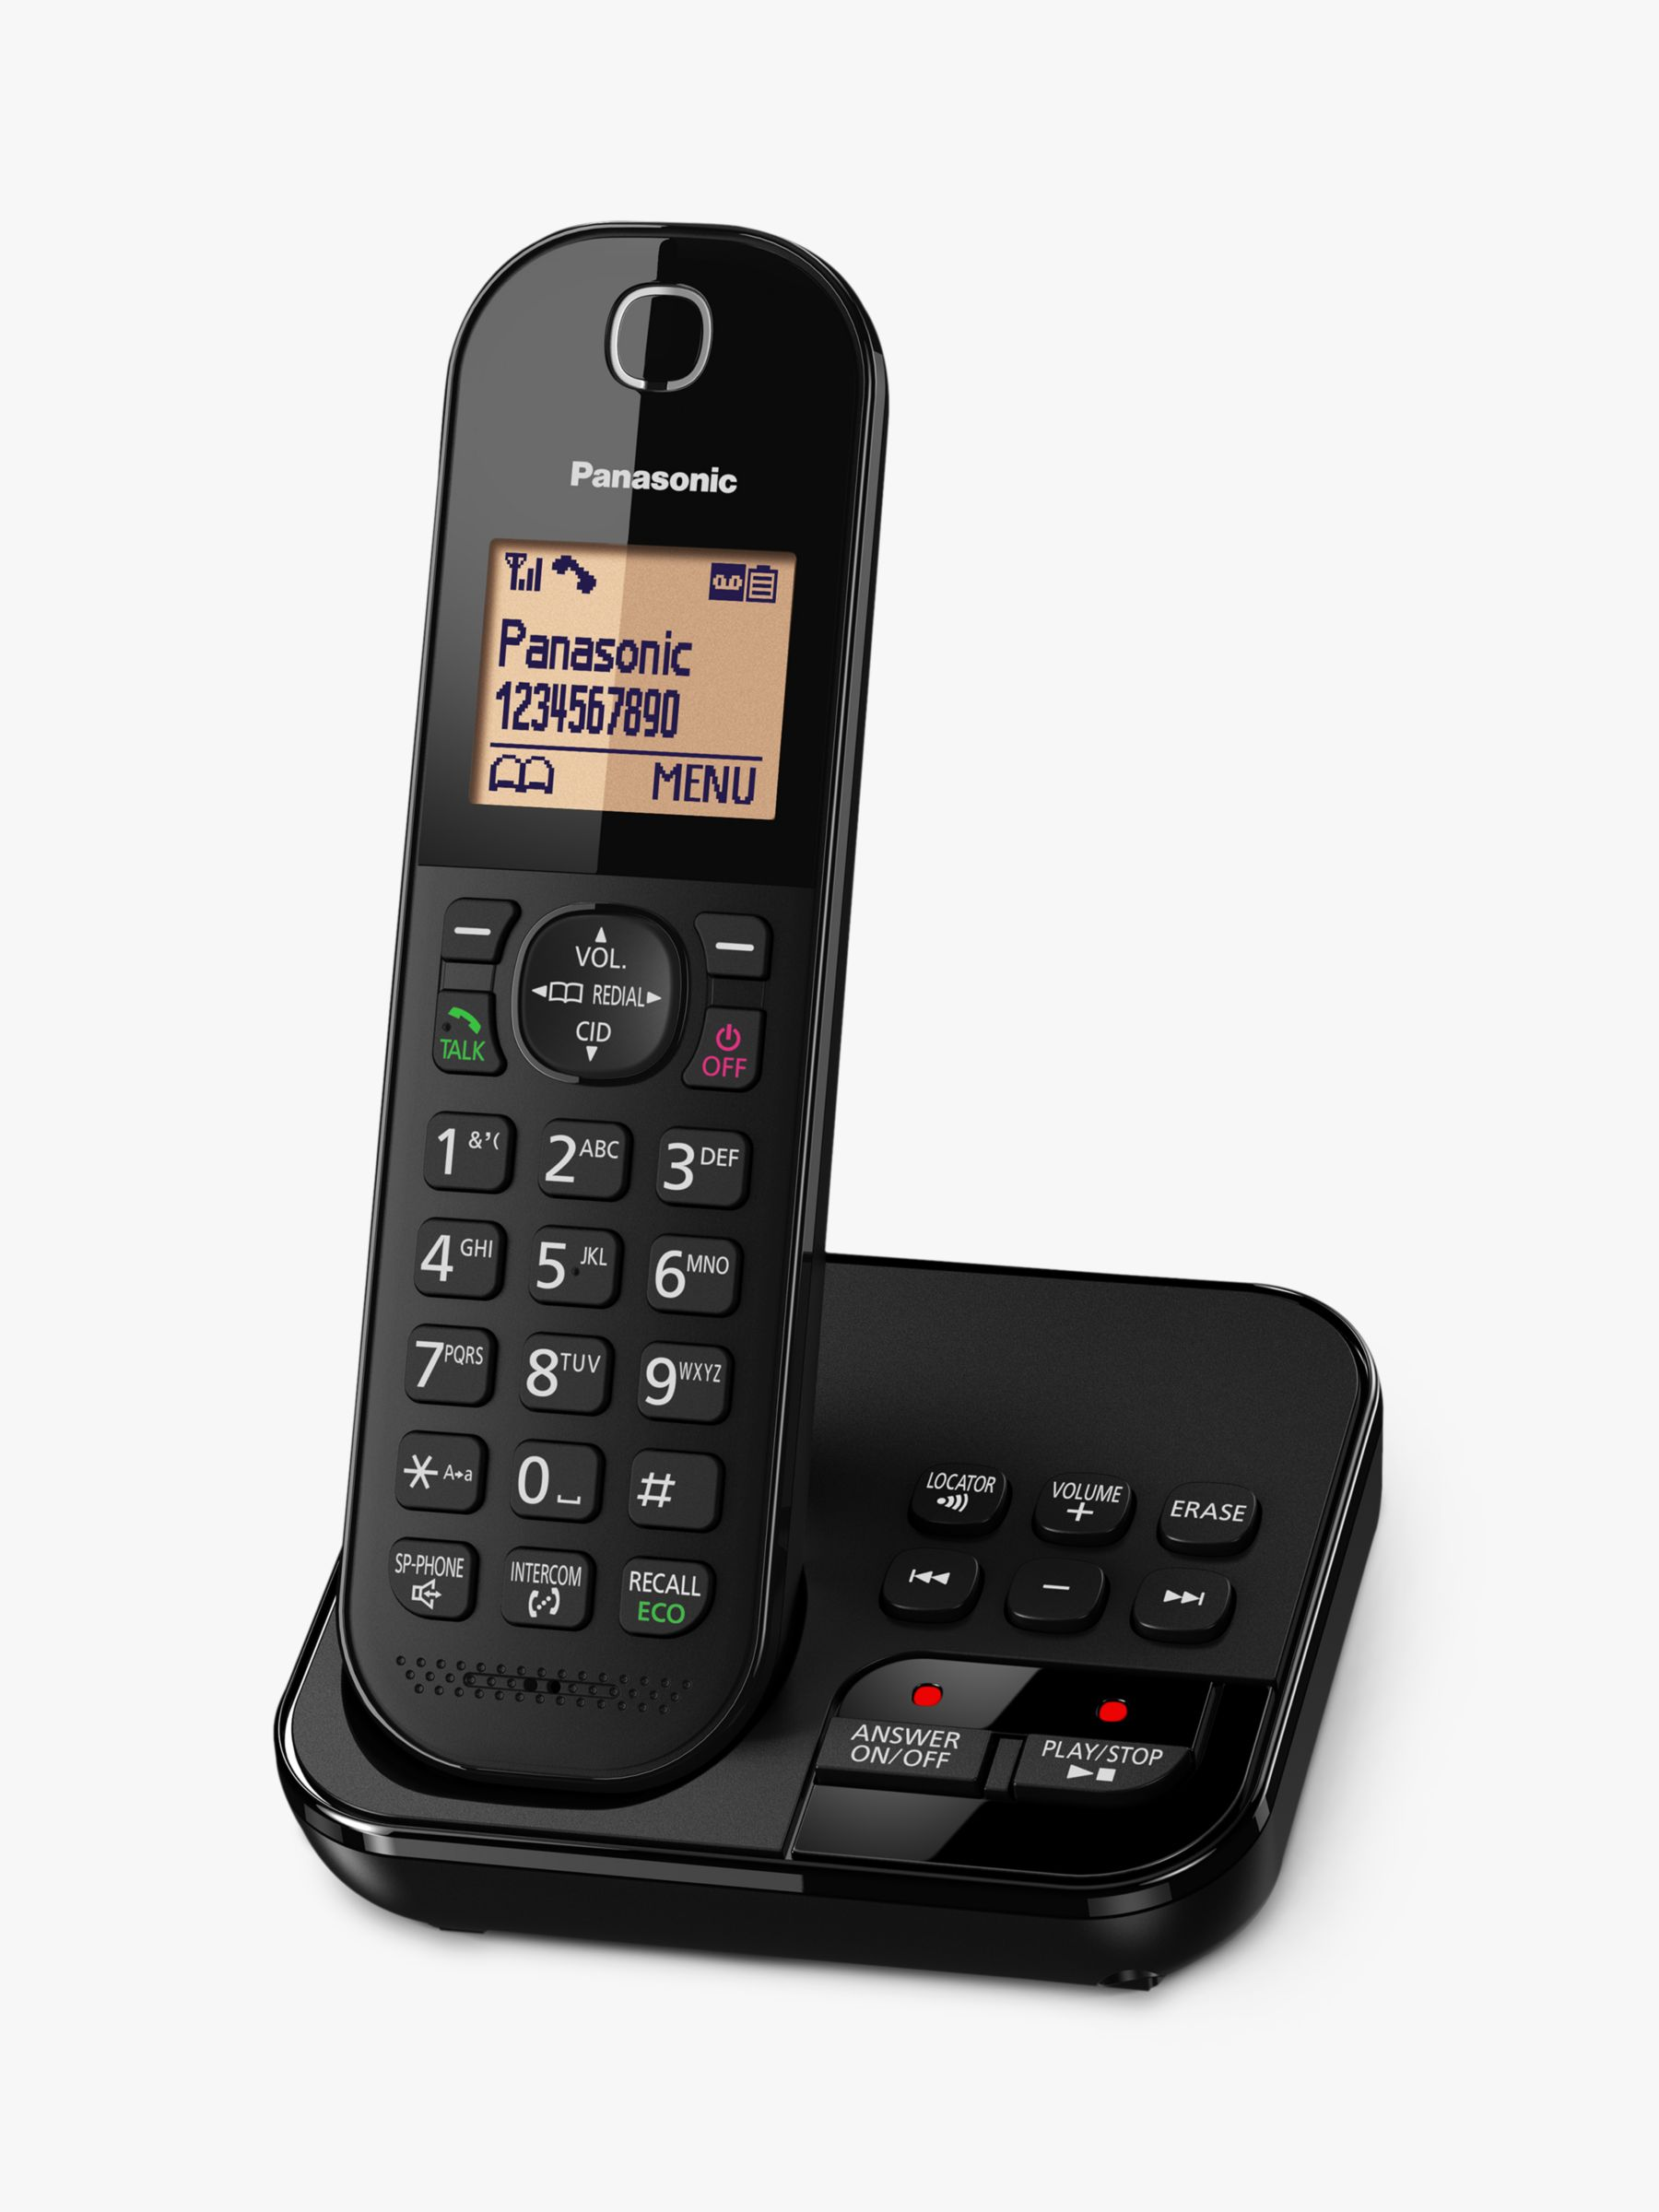 Panasonic Panasonic KX-TGC420EB Digital Cordless Telephone with 1.6 Backlit LCD Screen, Nuisance Call Blocker & Answering Machine, Single DECT